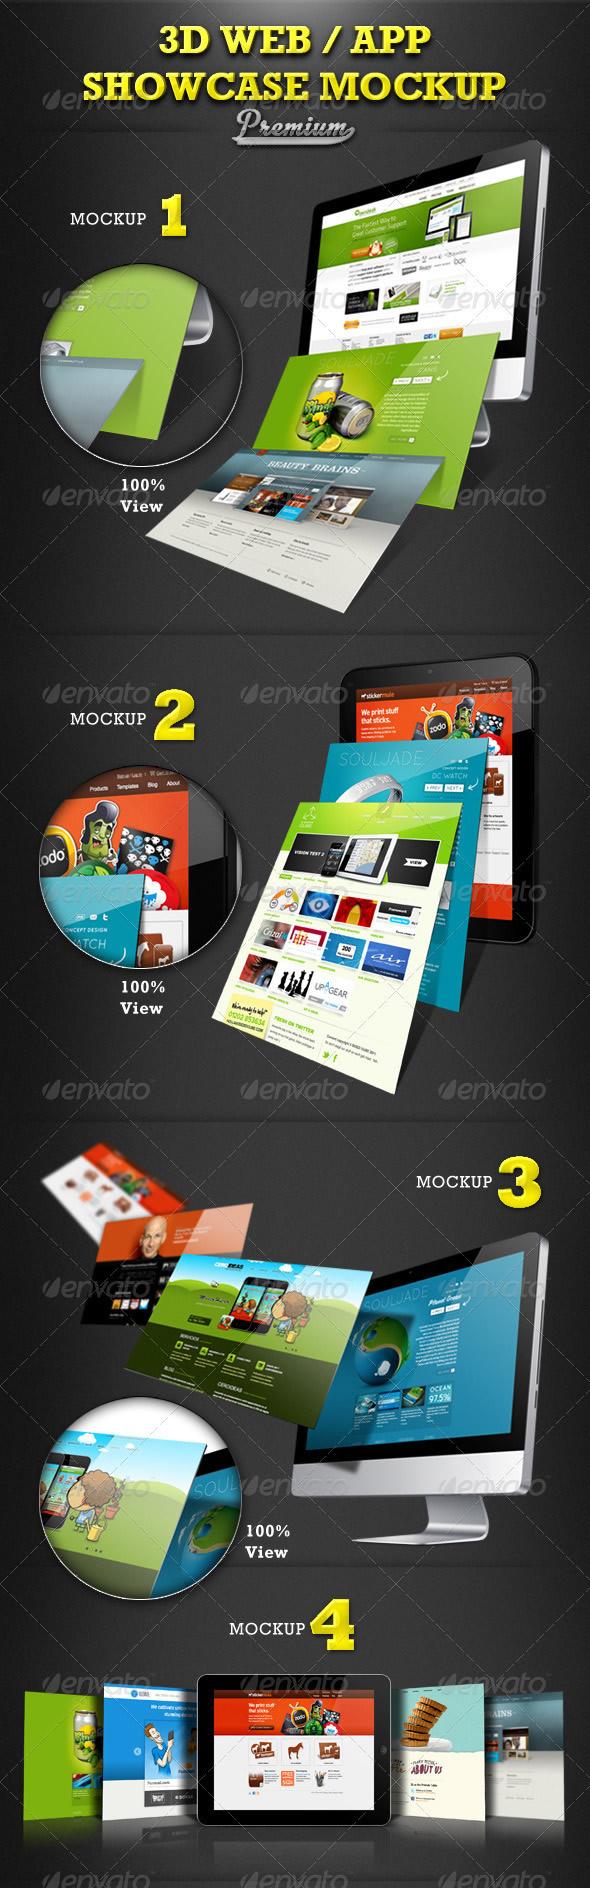 Web / App Showcase Mockup